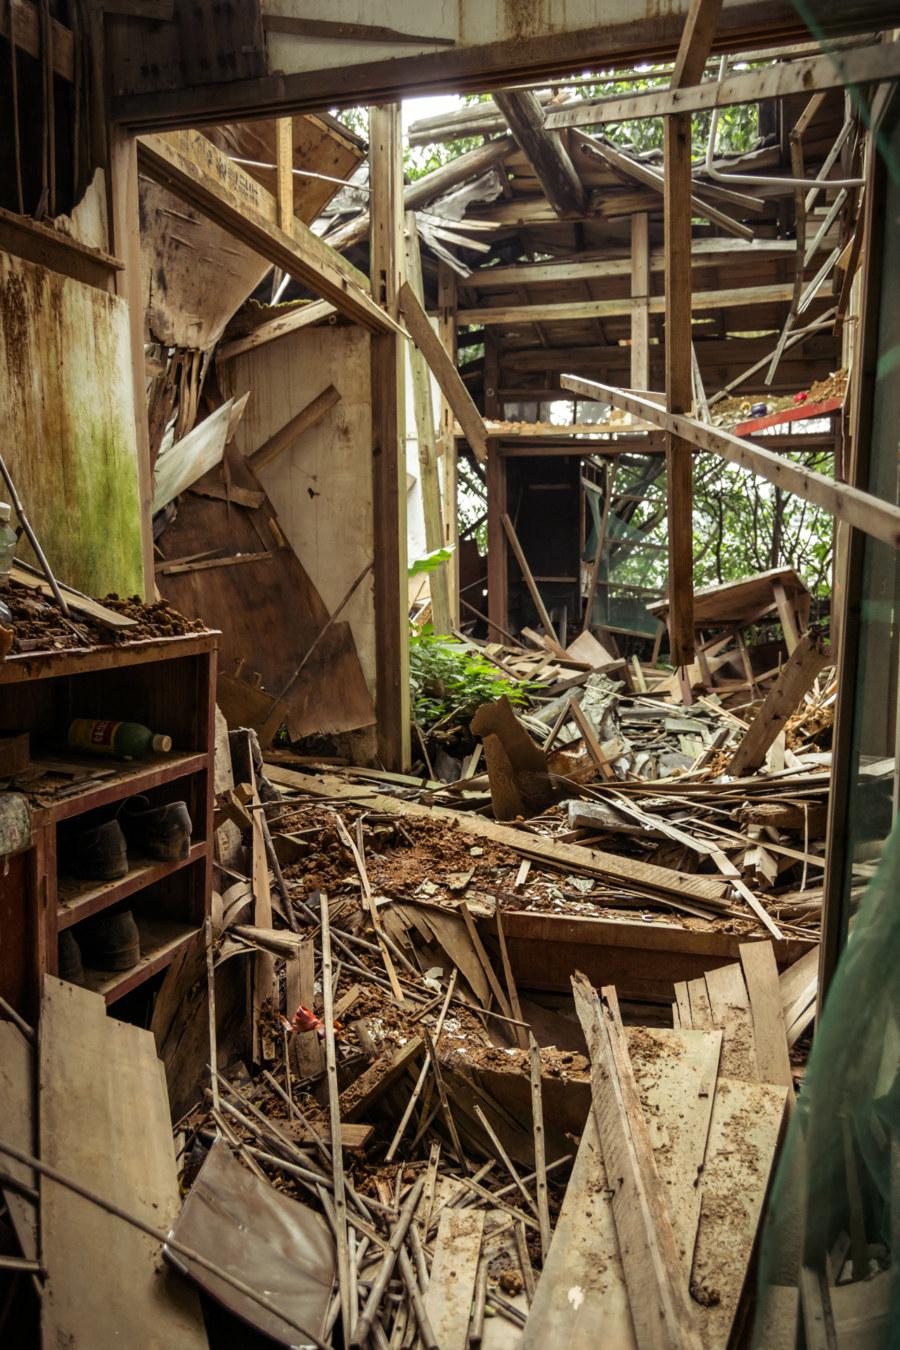 The ruins of an abandoned home in Jinguashi